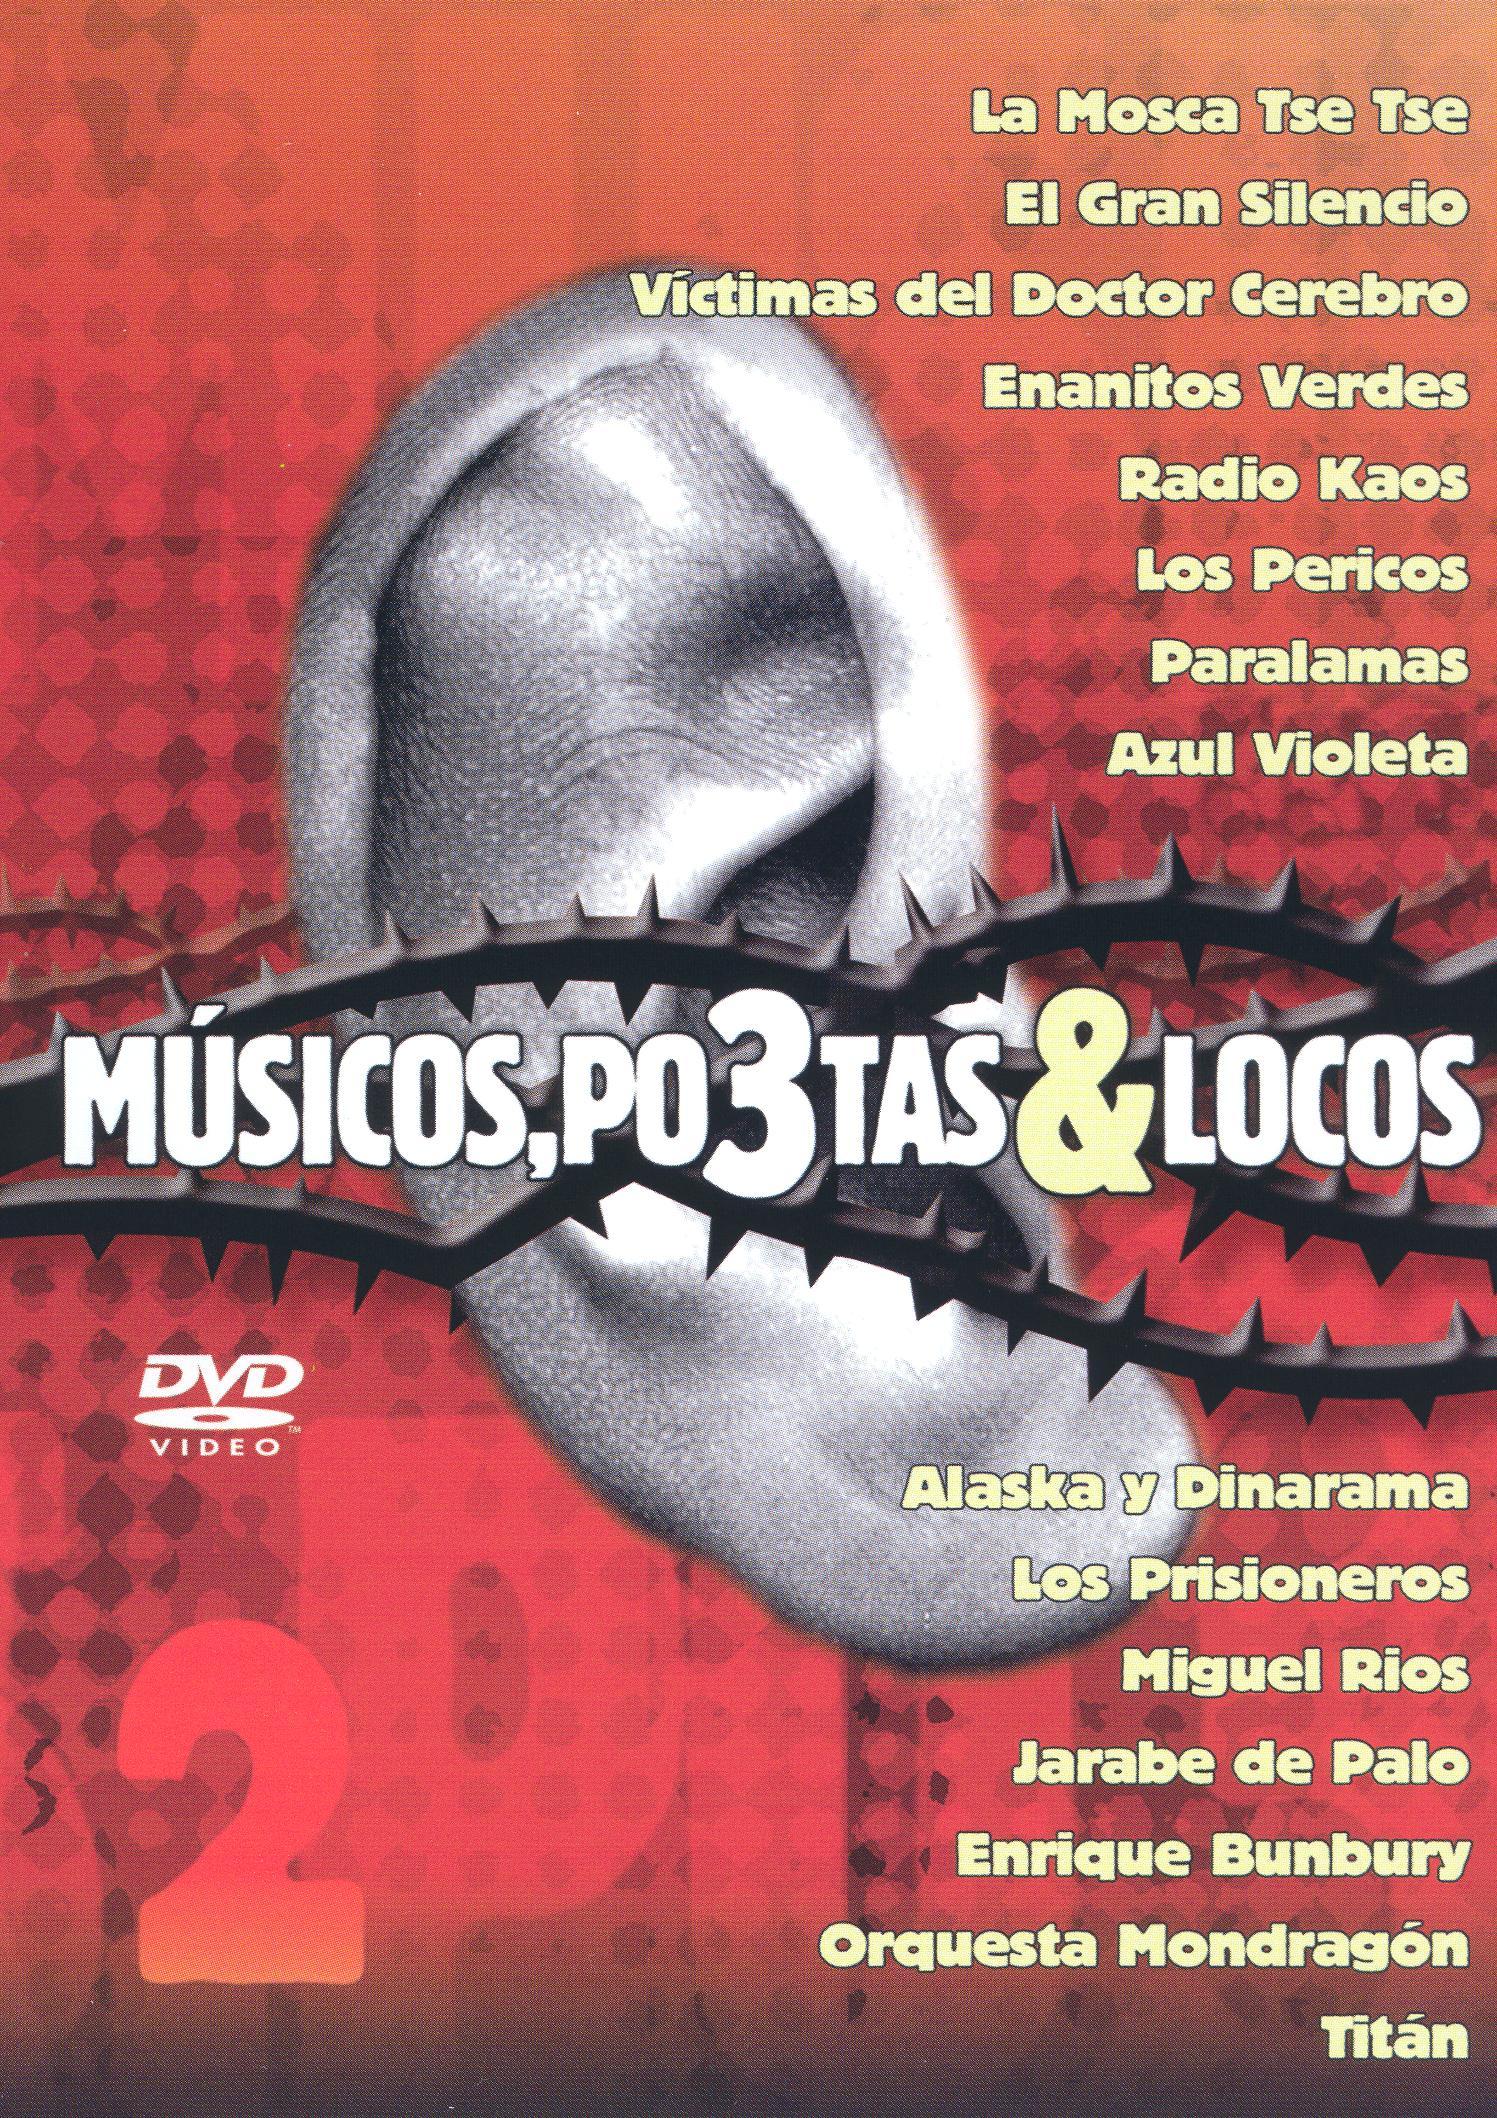 Musicos, Po3tas & Locos